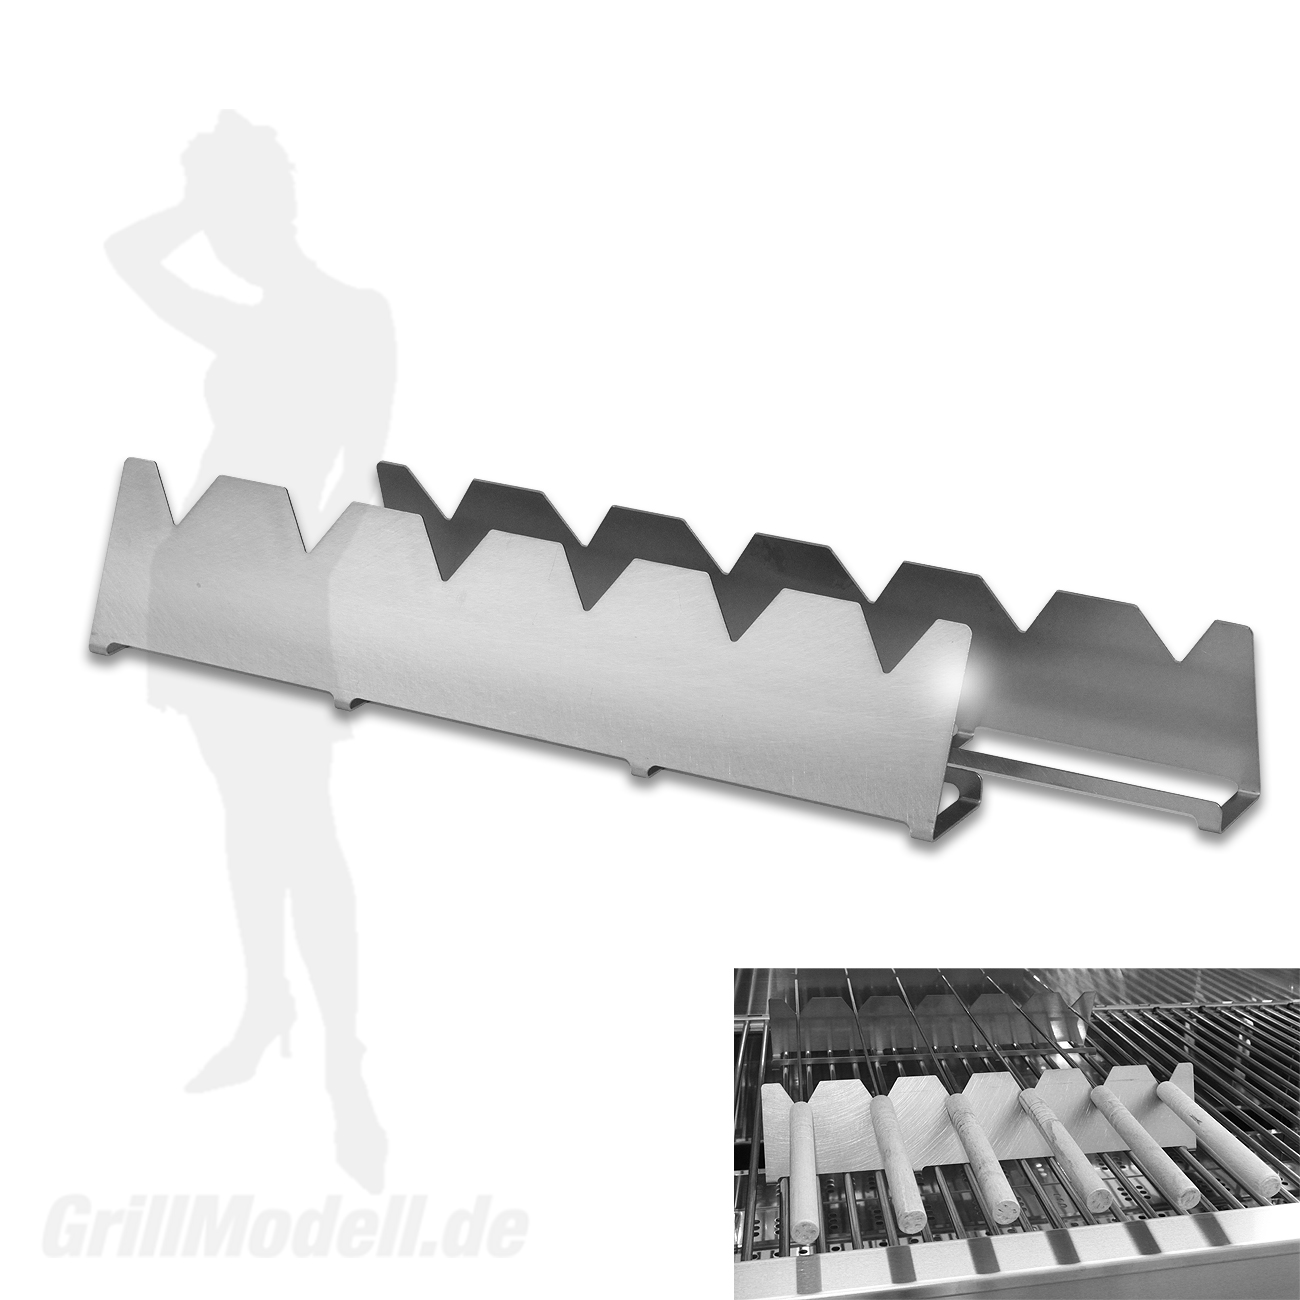 Spießhalter aus Edelstahl für Edelstahlgrill Holzkohlegrill